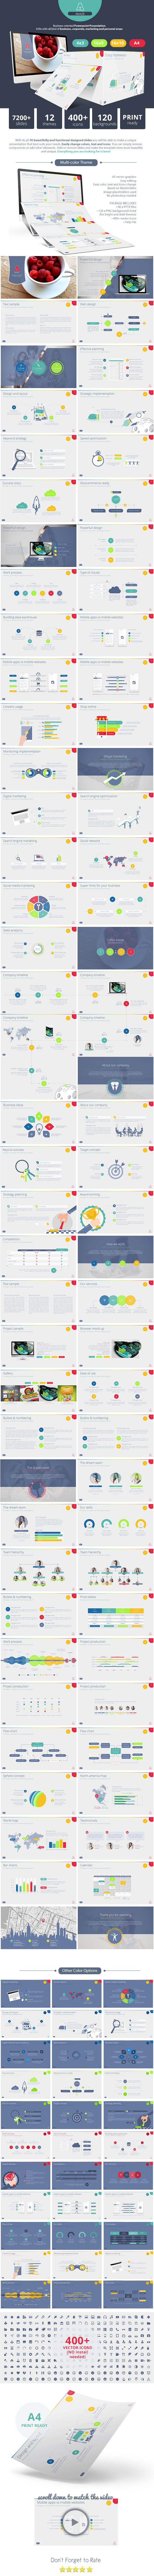 Amaze Powerpoint Presentation (PowerPoint Templates)